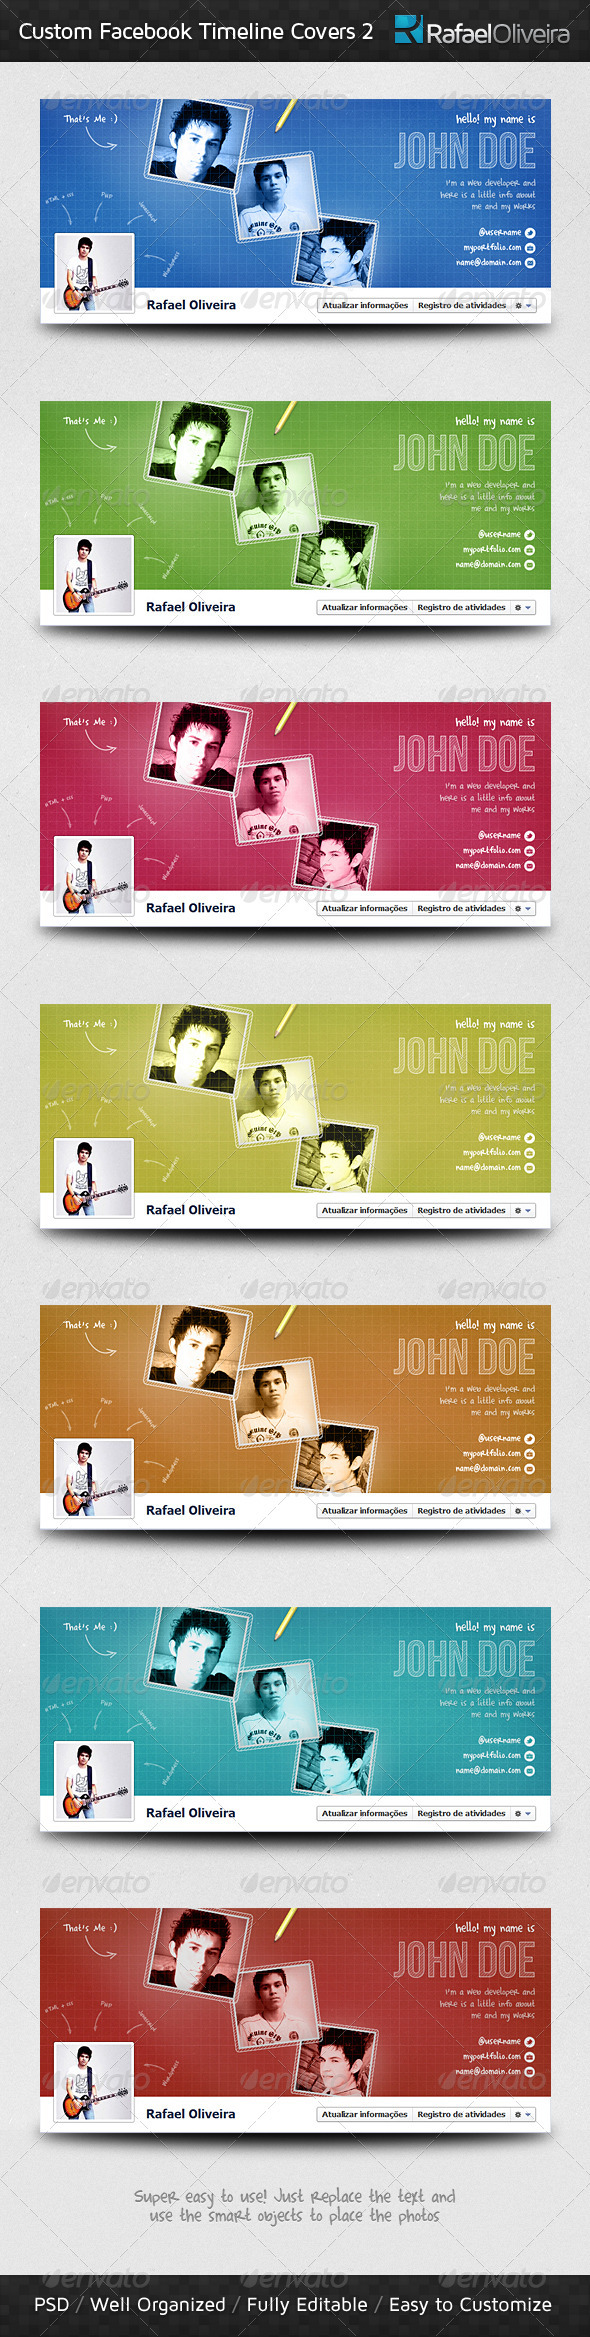 GraphicRiver Custom Facebook Timeline Covers 2 1501861